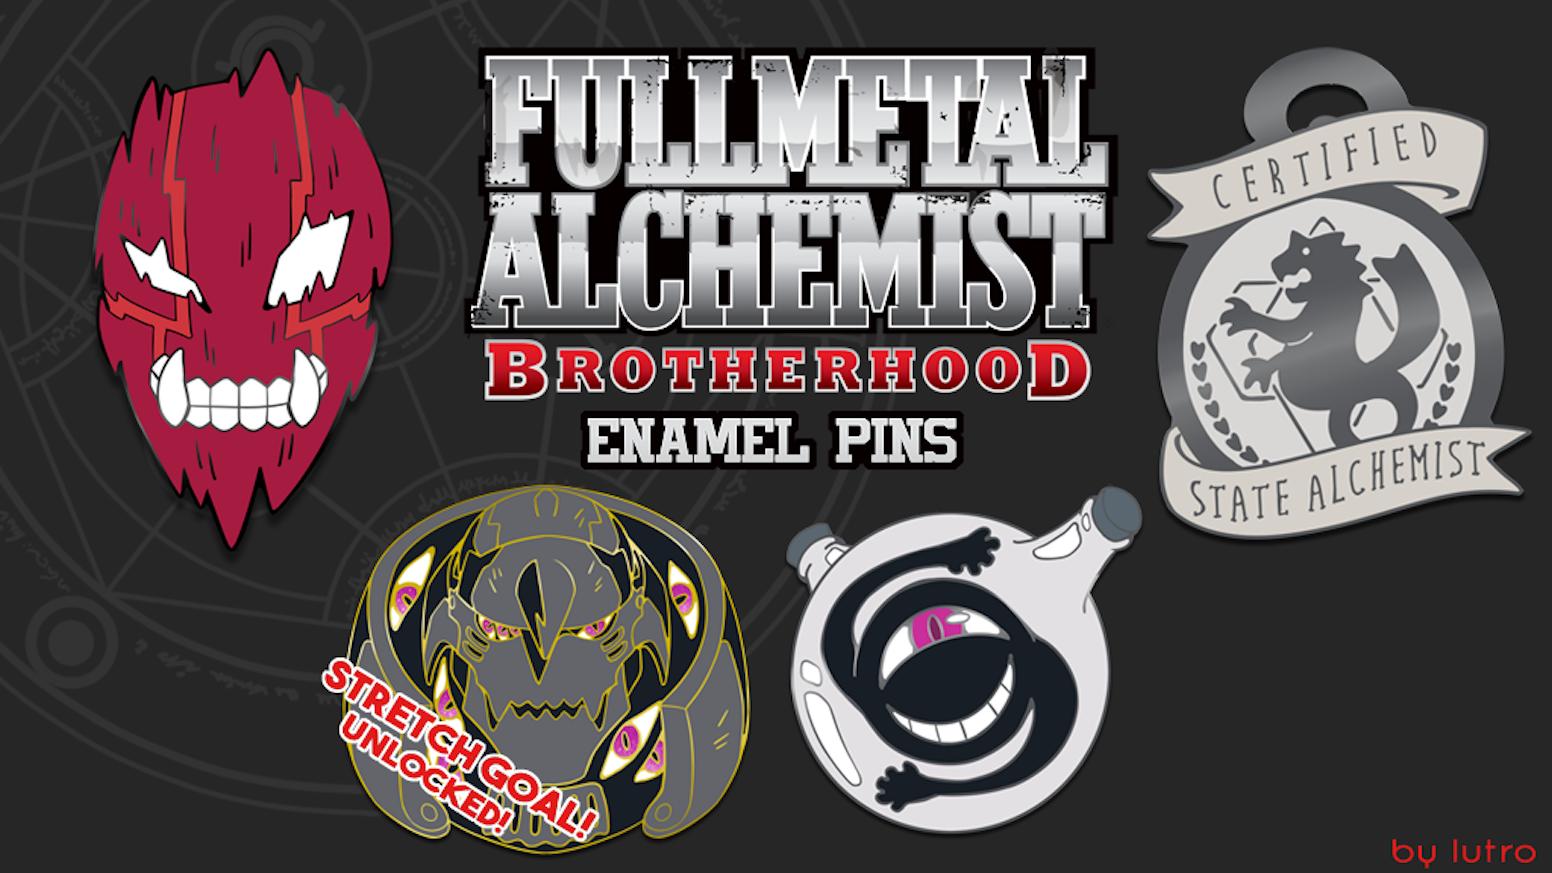 Fullmetal Alchemist Brotherhood Enamel Pins By Oliver Lutro